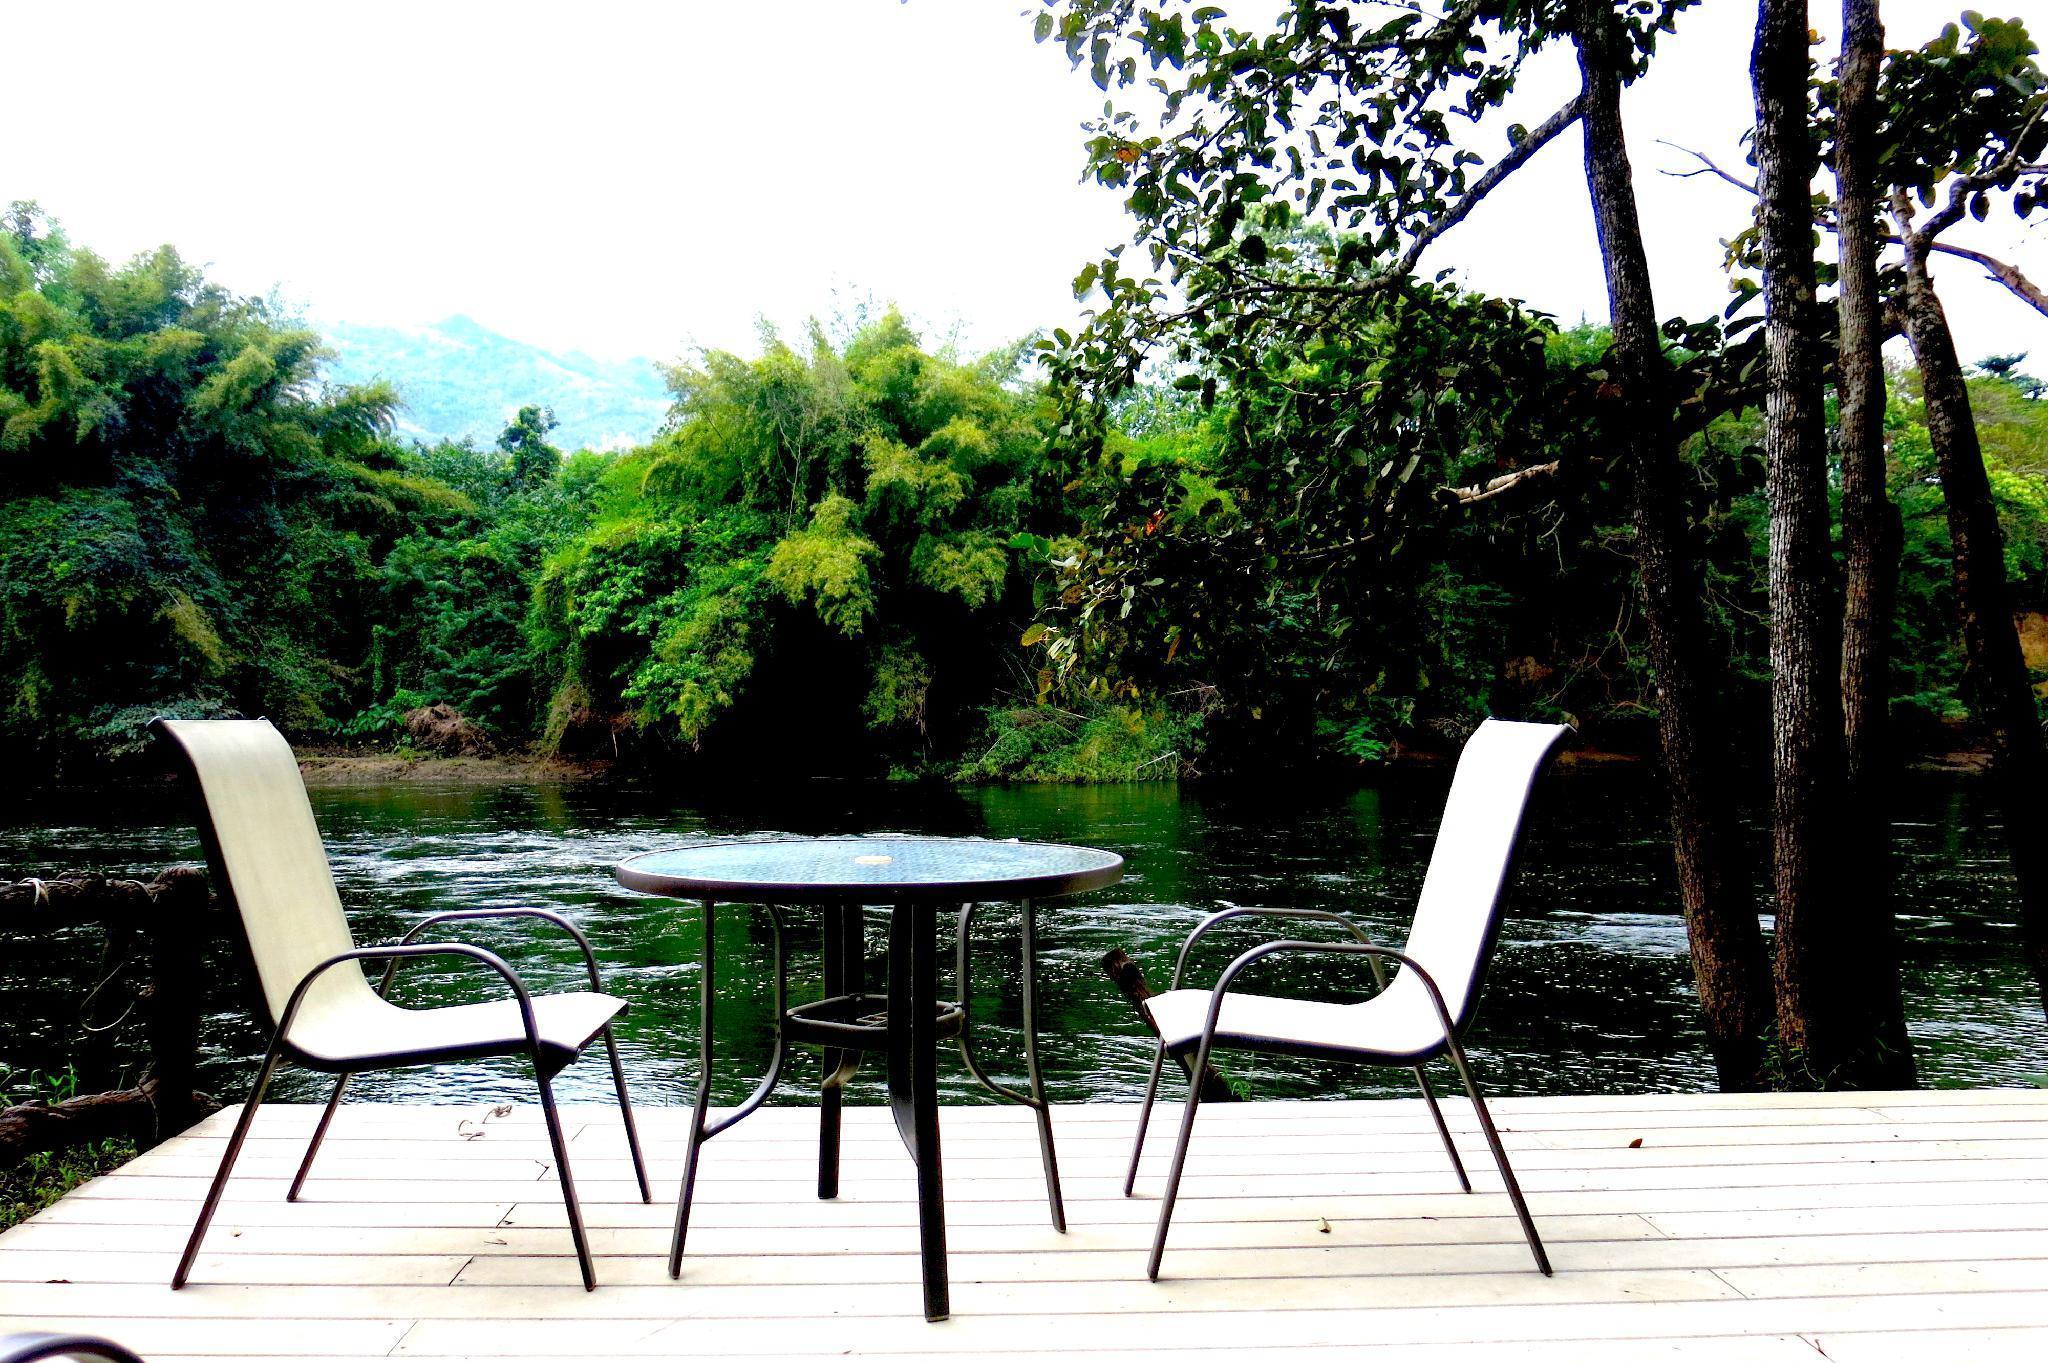 La Foresta by the river lodge Kanchanaburi# villa2 วิลลา 1 ห้องนอน 1 ห้องน้ำส่วนตัว ขนาด 60 ตร.ม. – วังด้ง